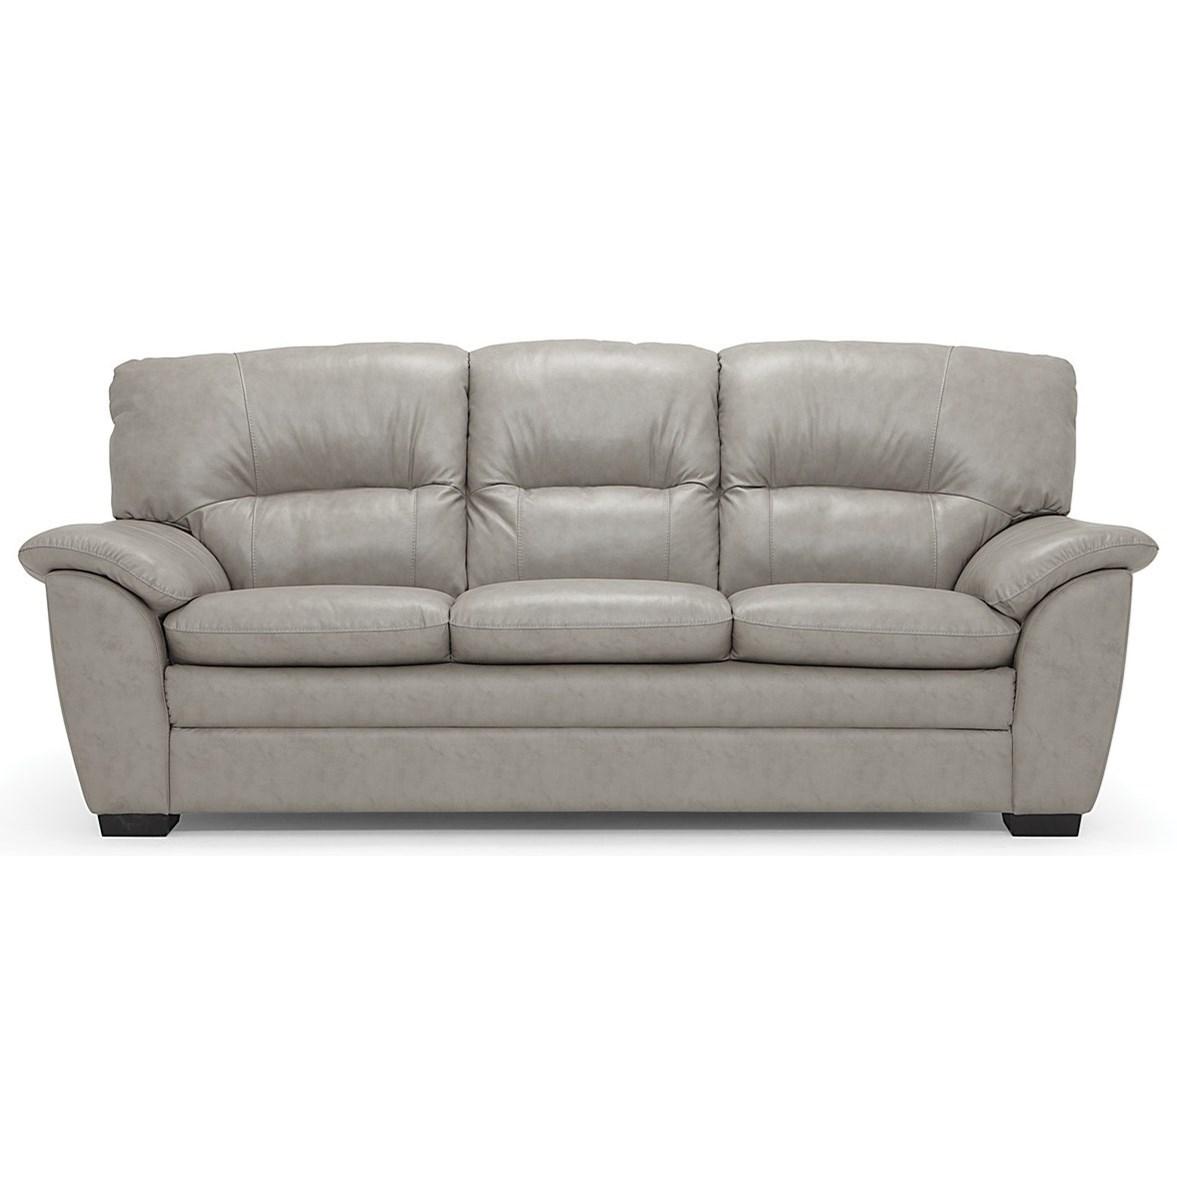 Amisk Sofa by Palliser at Reid's Furniture